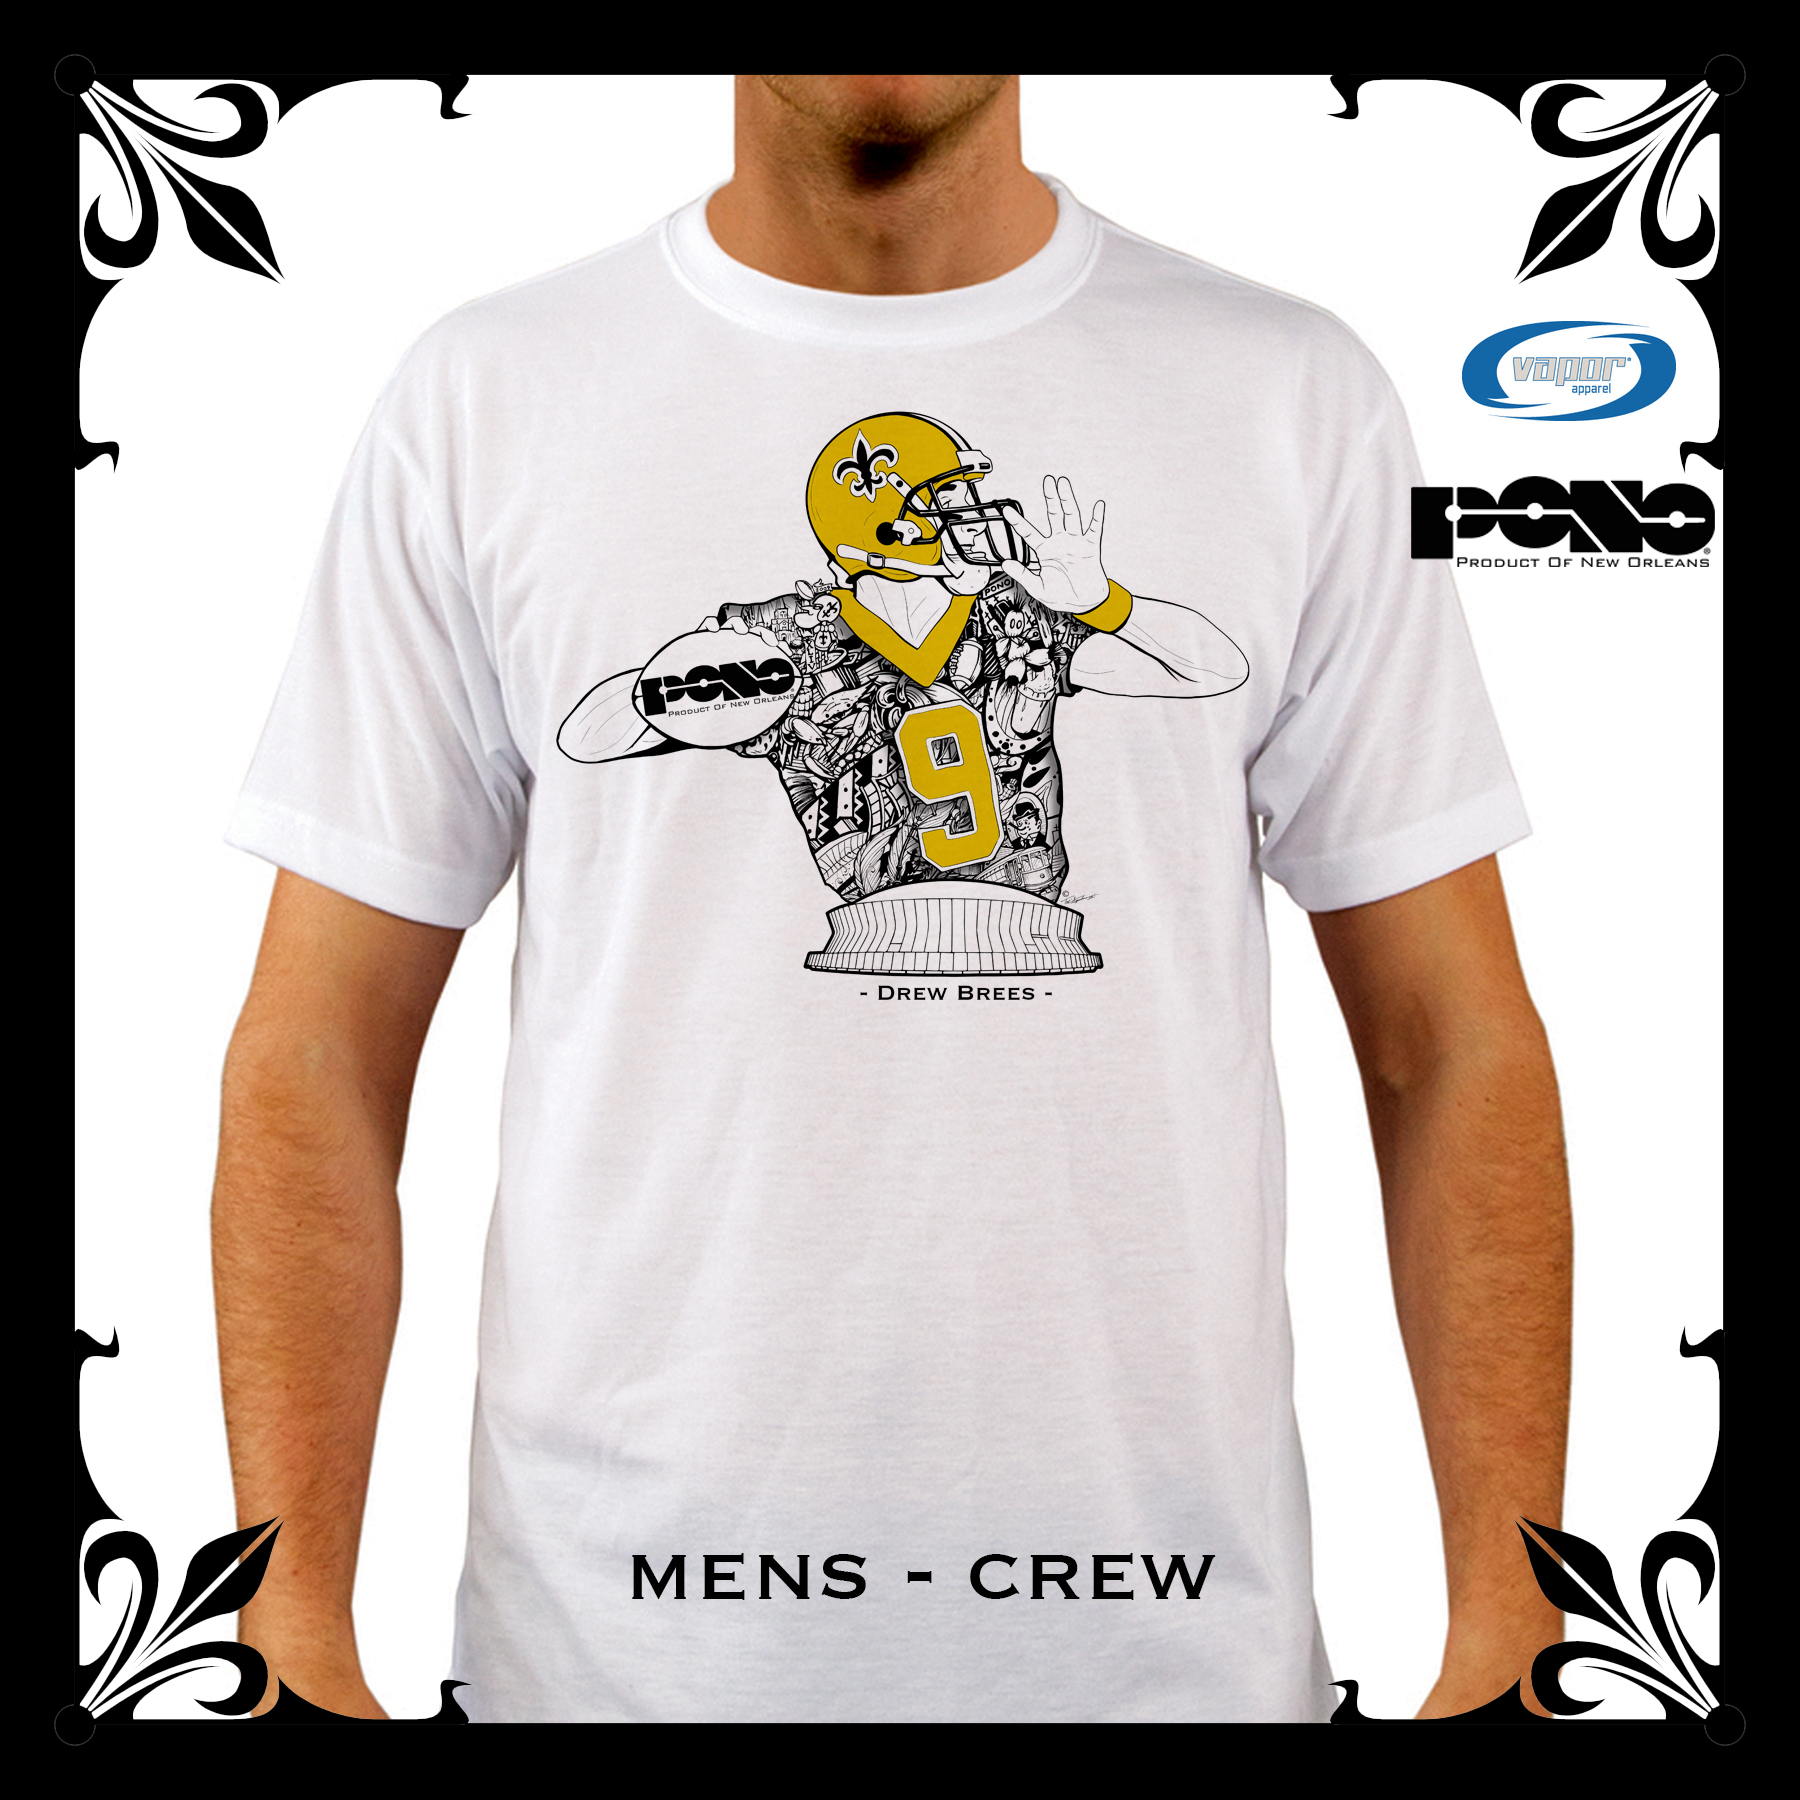 PONO #1 MENS CREW DREW BREES.jpg